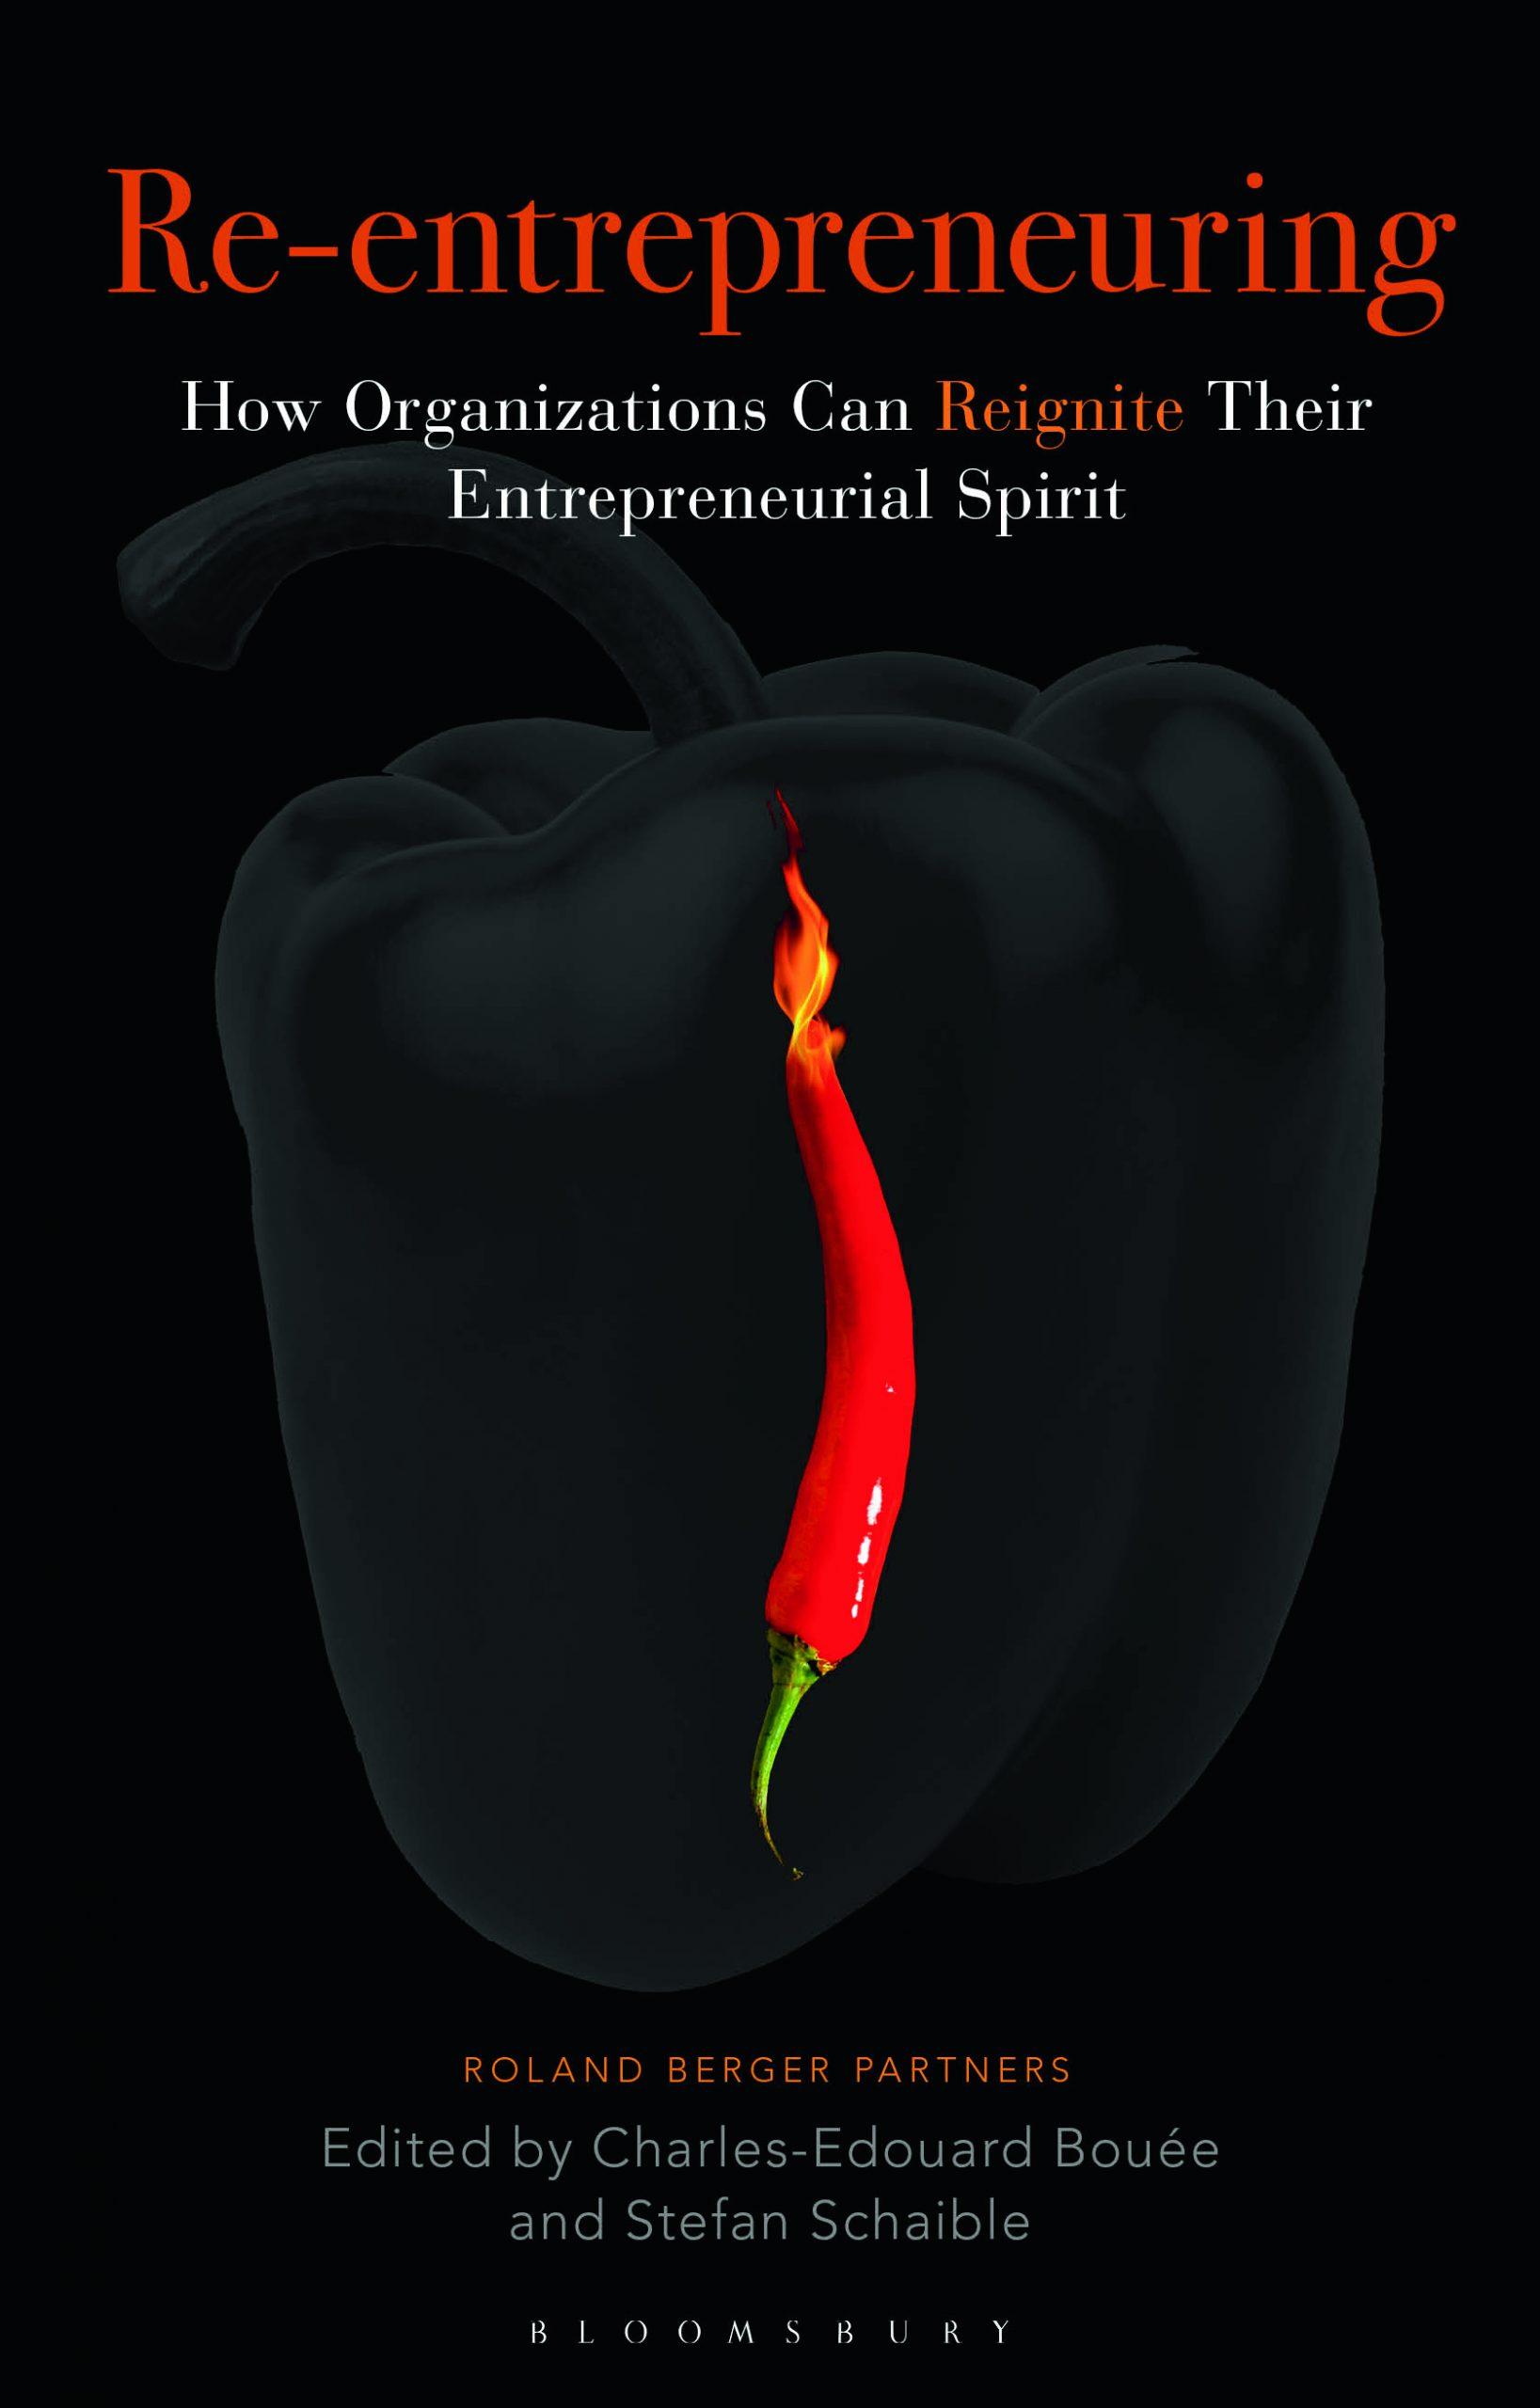 Re-entrepreneuring